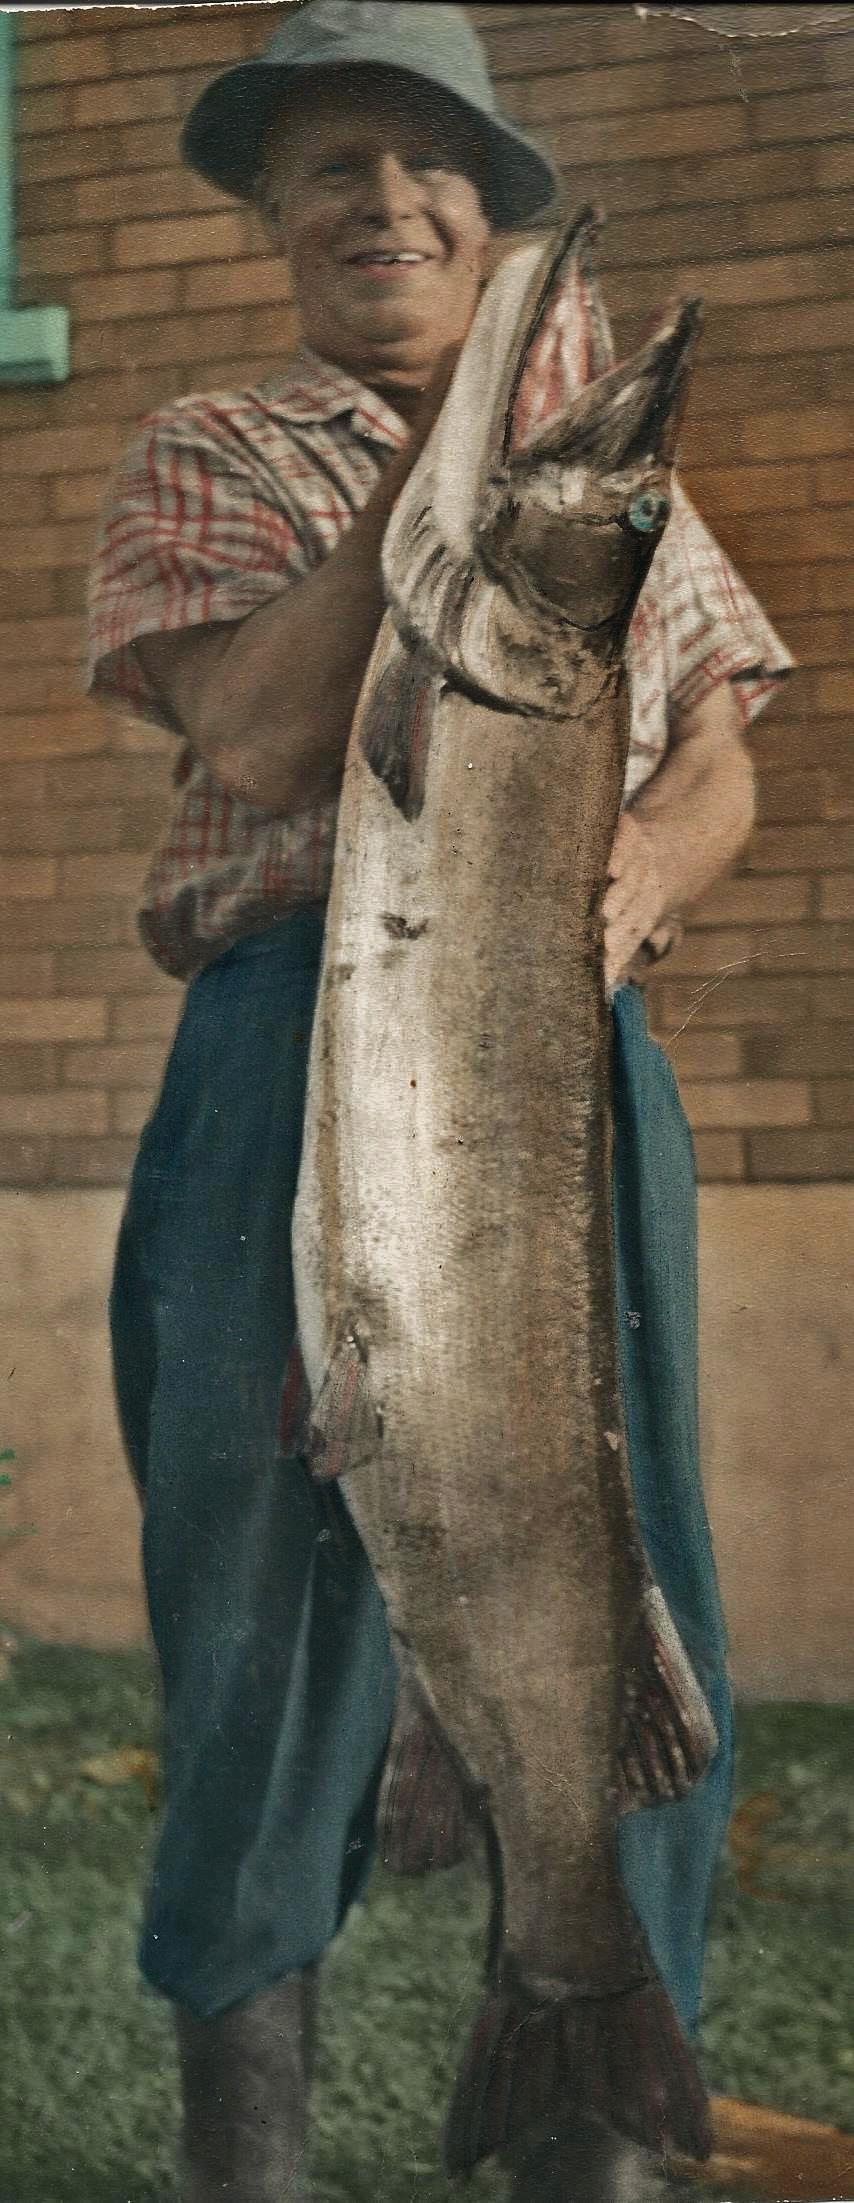 George Brooks & 42 lb Fish, 1948